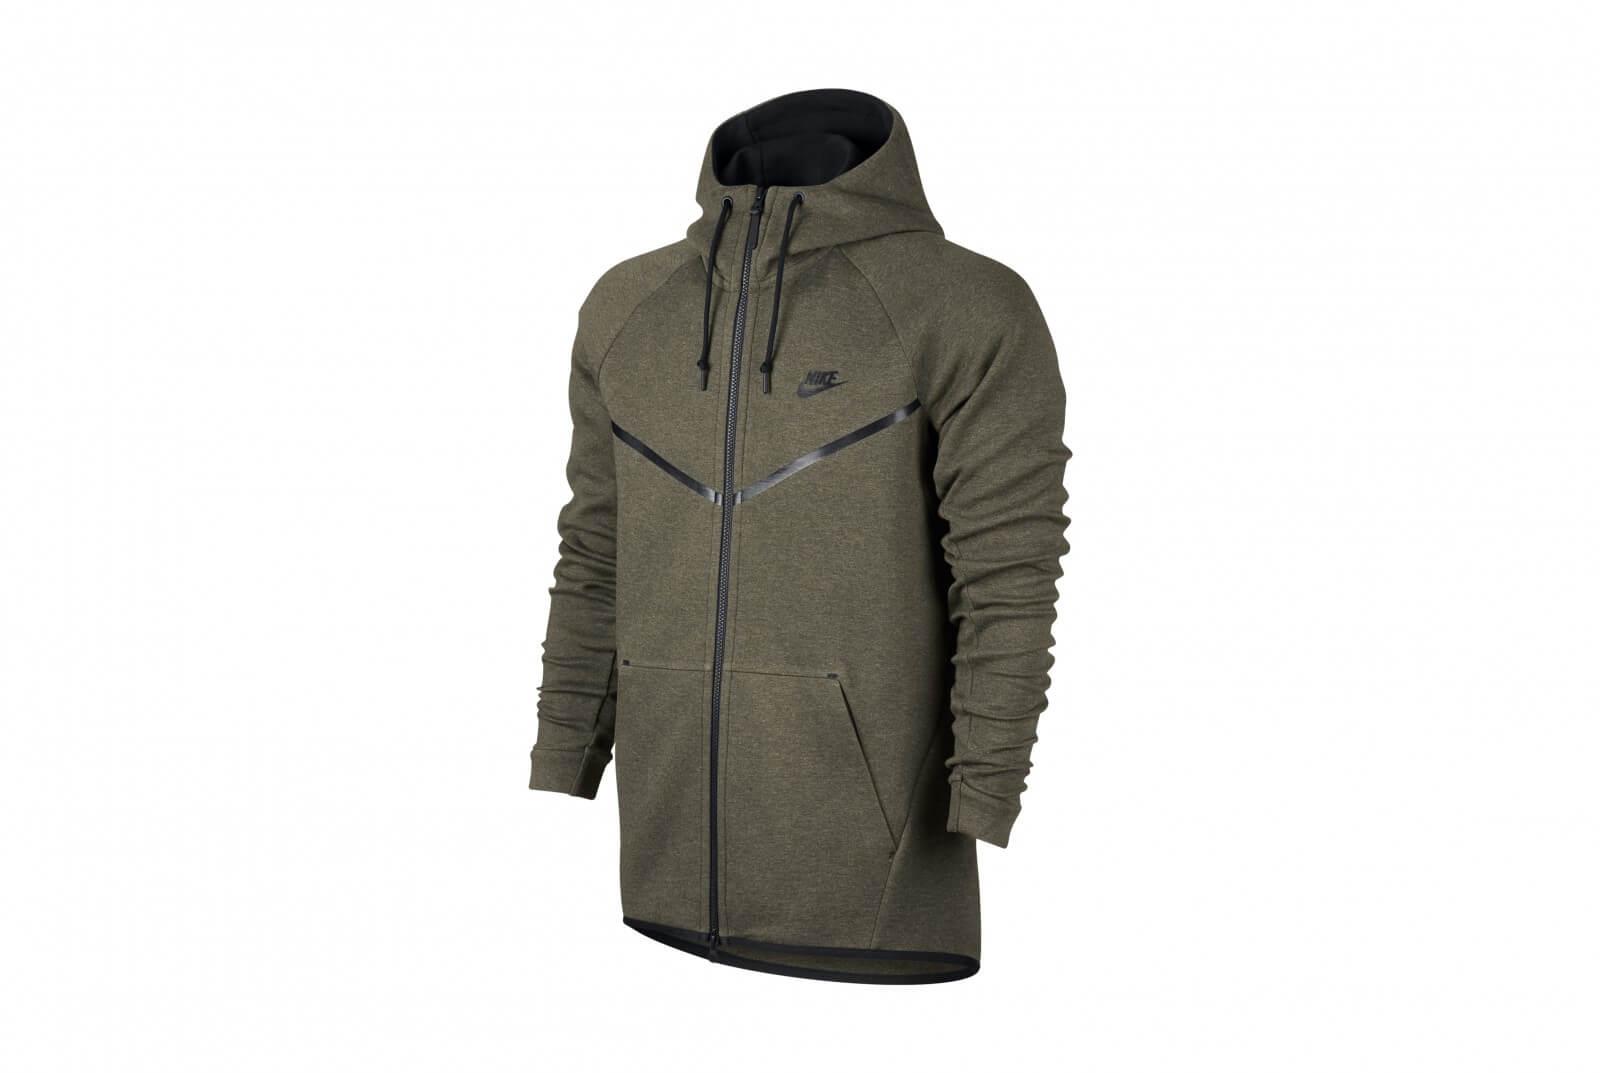 Nike Sportswear Tech Fleece Windrunner Medium Olive Heather Black 805144 222